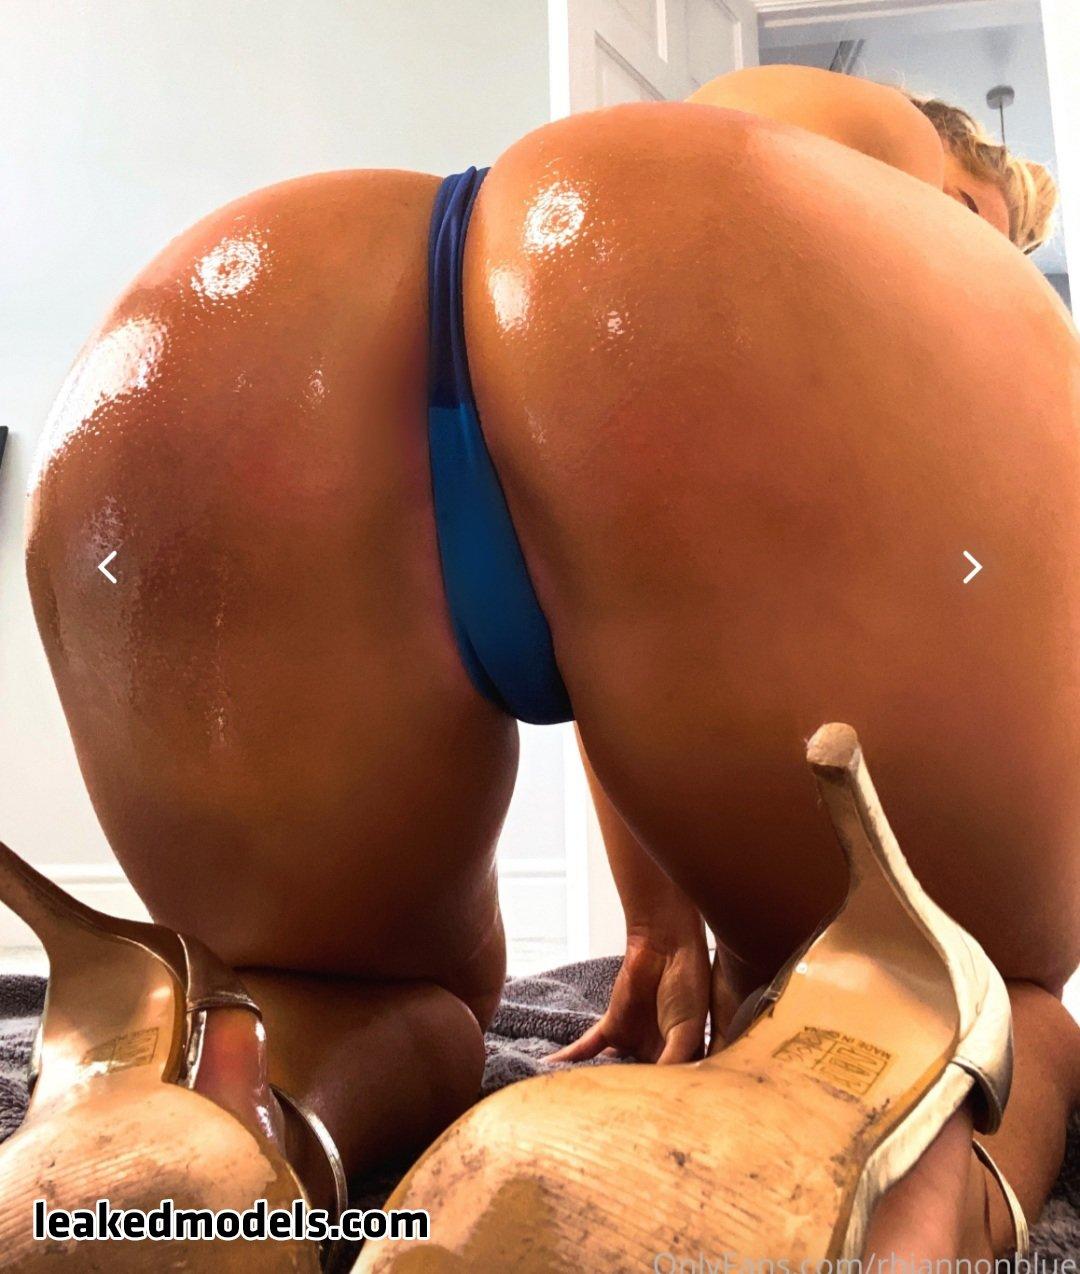 Rhiannon Blue Taylor – rhiannonblue OnlyFans Nude Leaks (25 Photos)